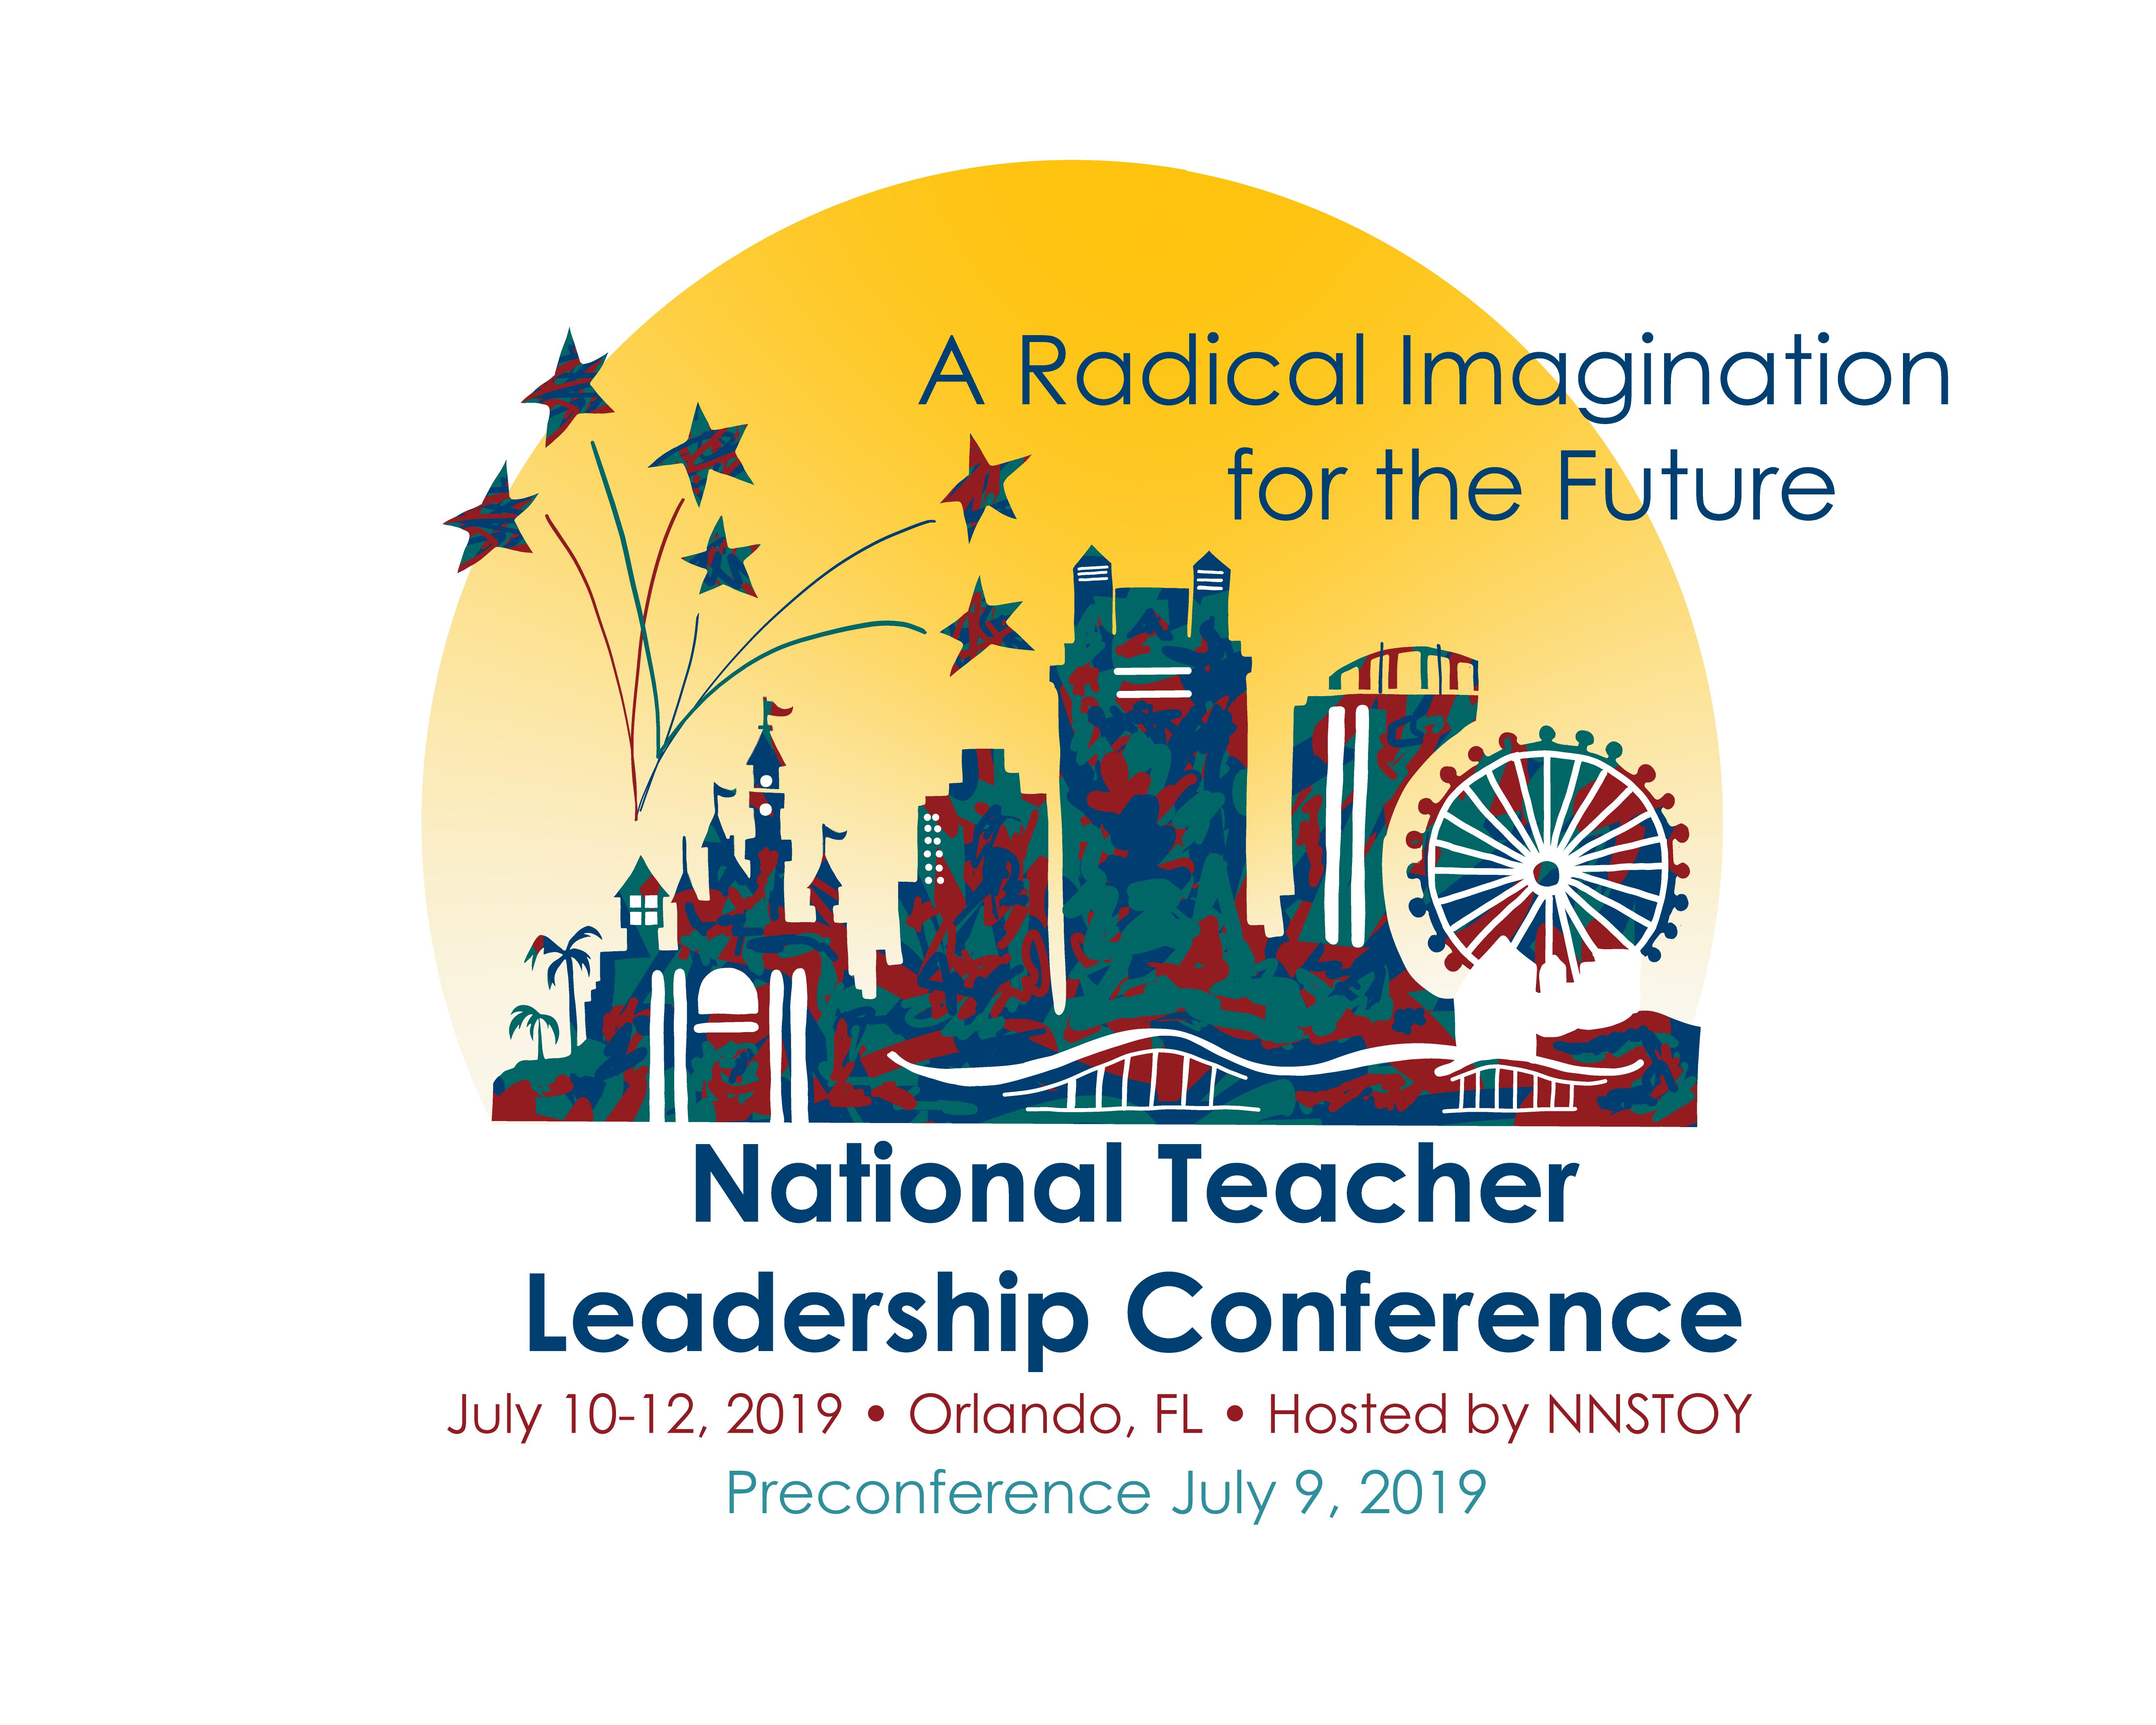 NNSTOY 2019 Conference